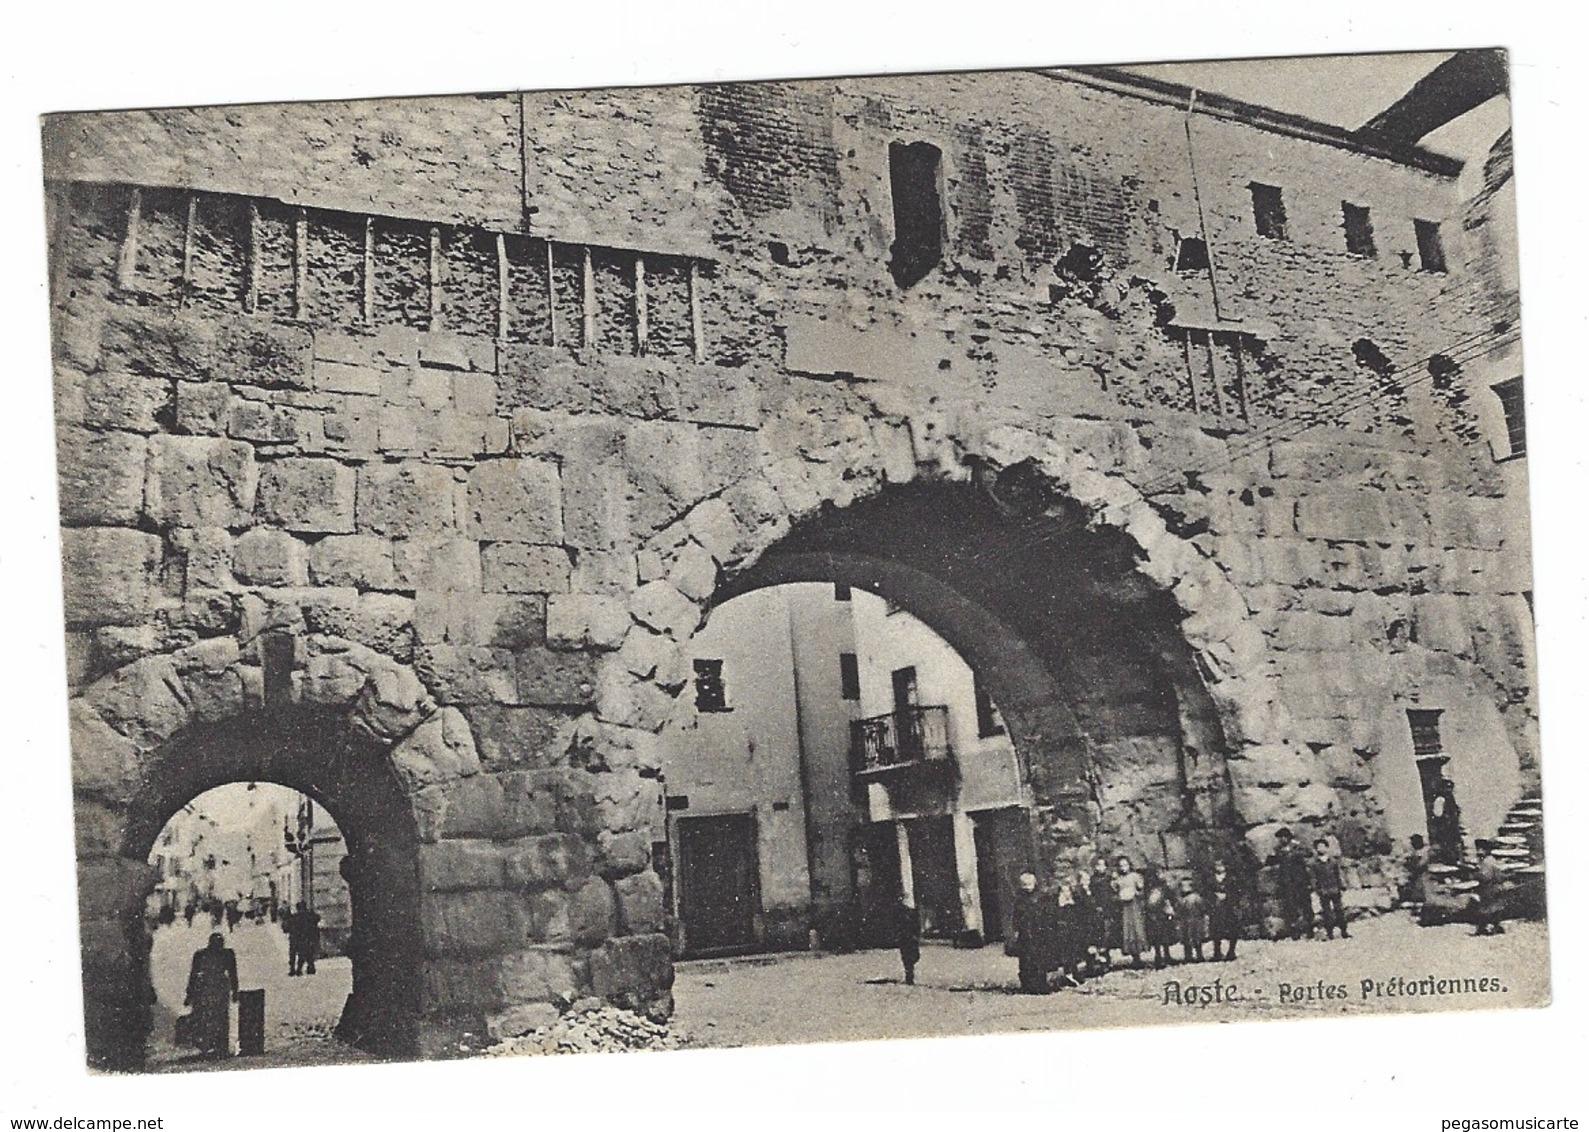 3011 - AOSTA AOSTE PORTES PRETORIENNES ANIMATA 1928 - Aosta